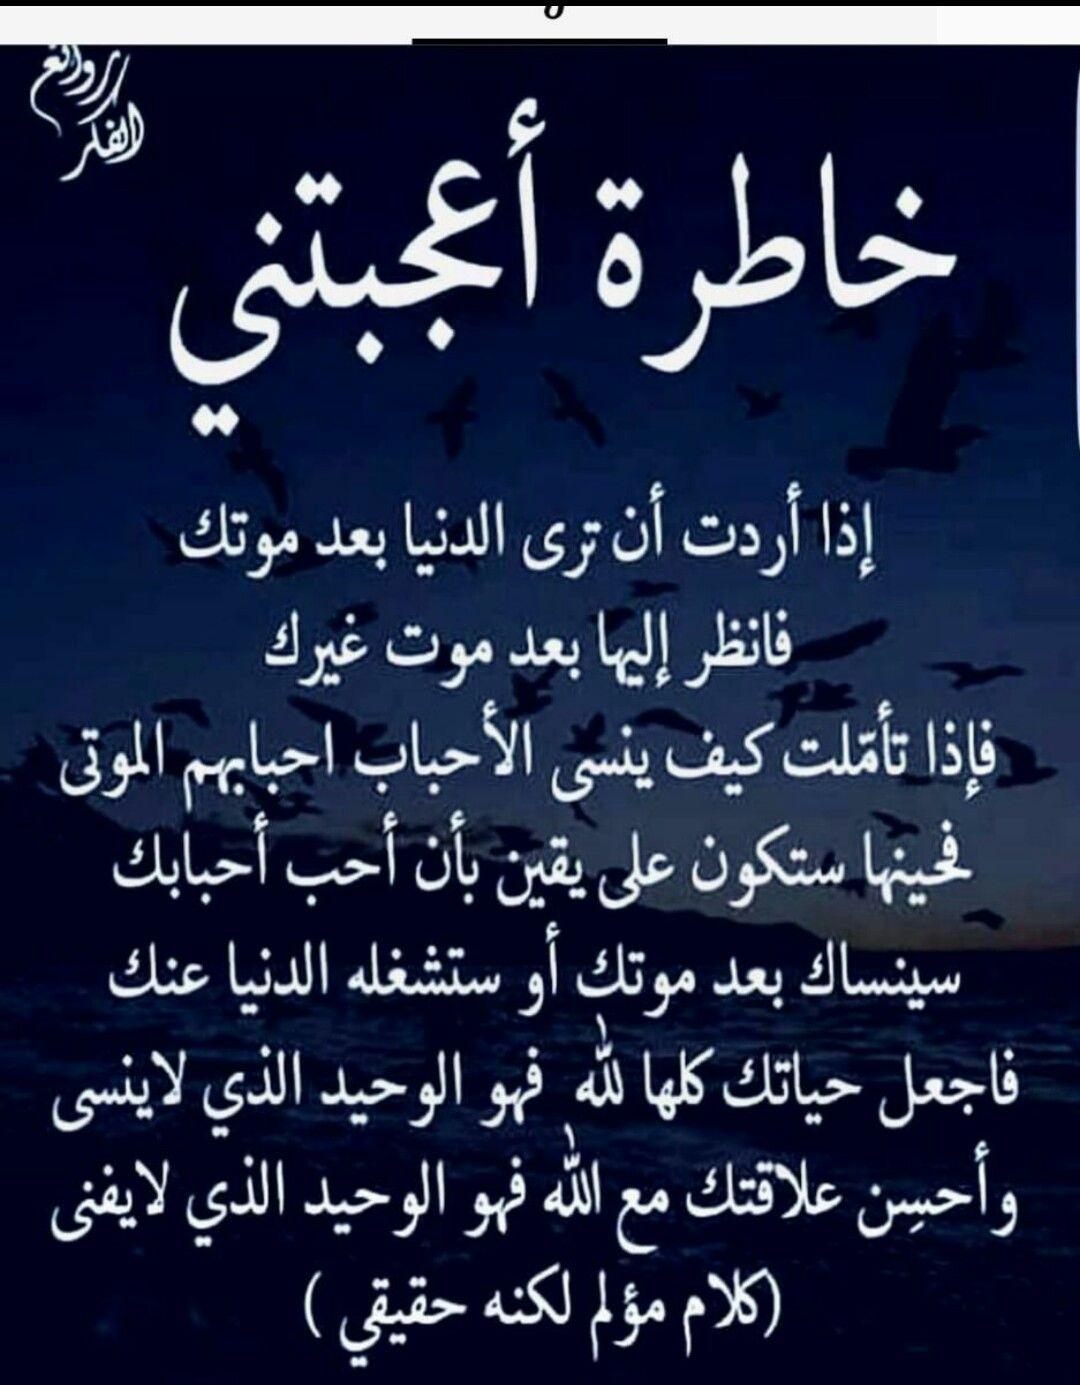 Pin By Maryamkhaledabdelhalim On Islam Quran Funny Arabic Quotes Quran Quotes Muslim Quotes